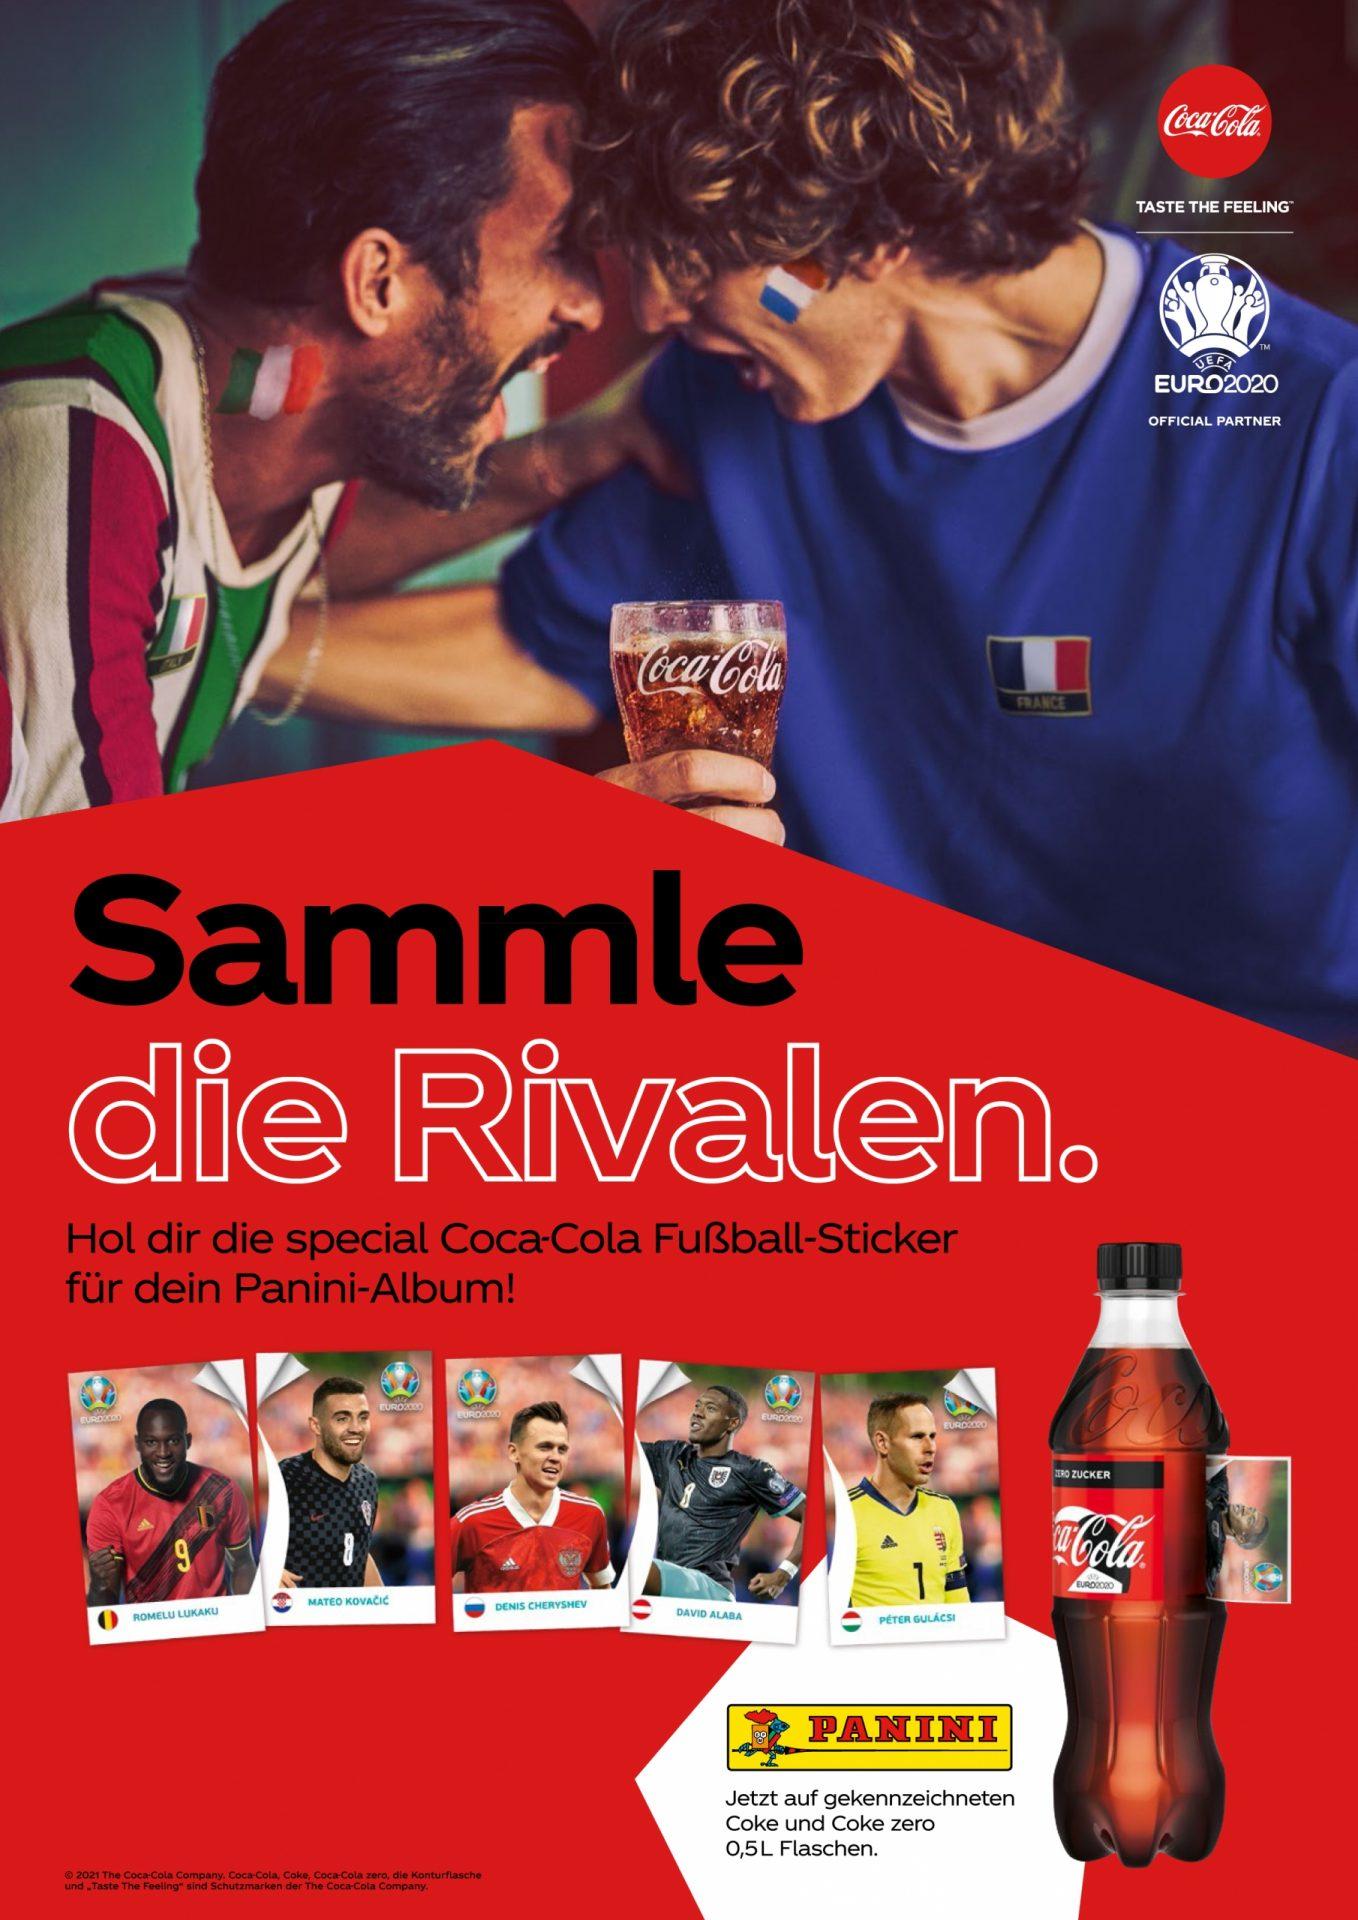 Coca Cola Panini Promotion scaled 17. Juni 2021